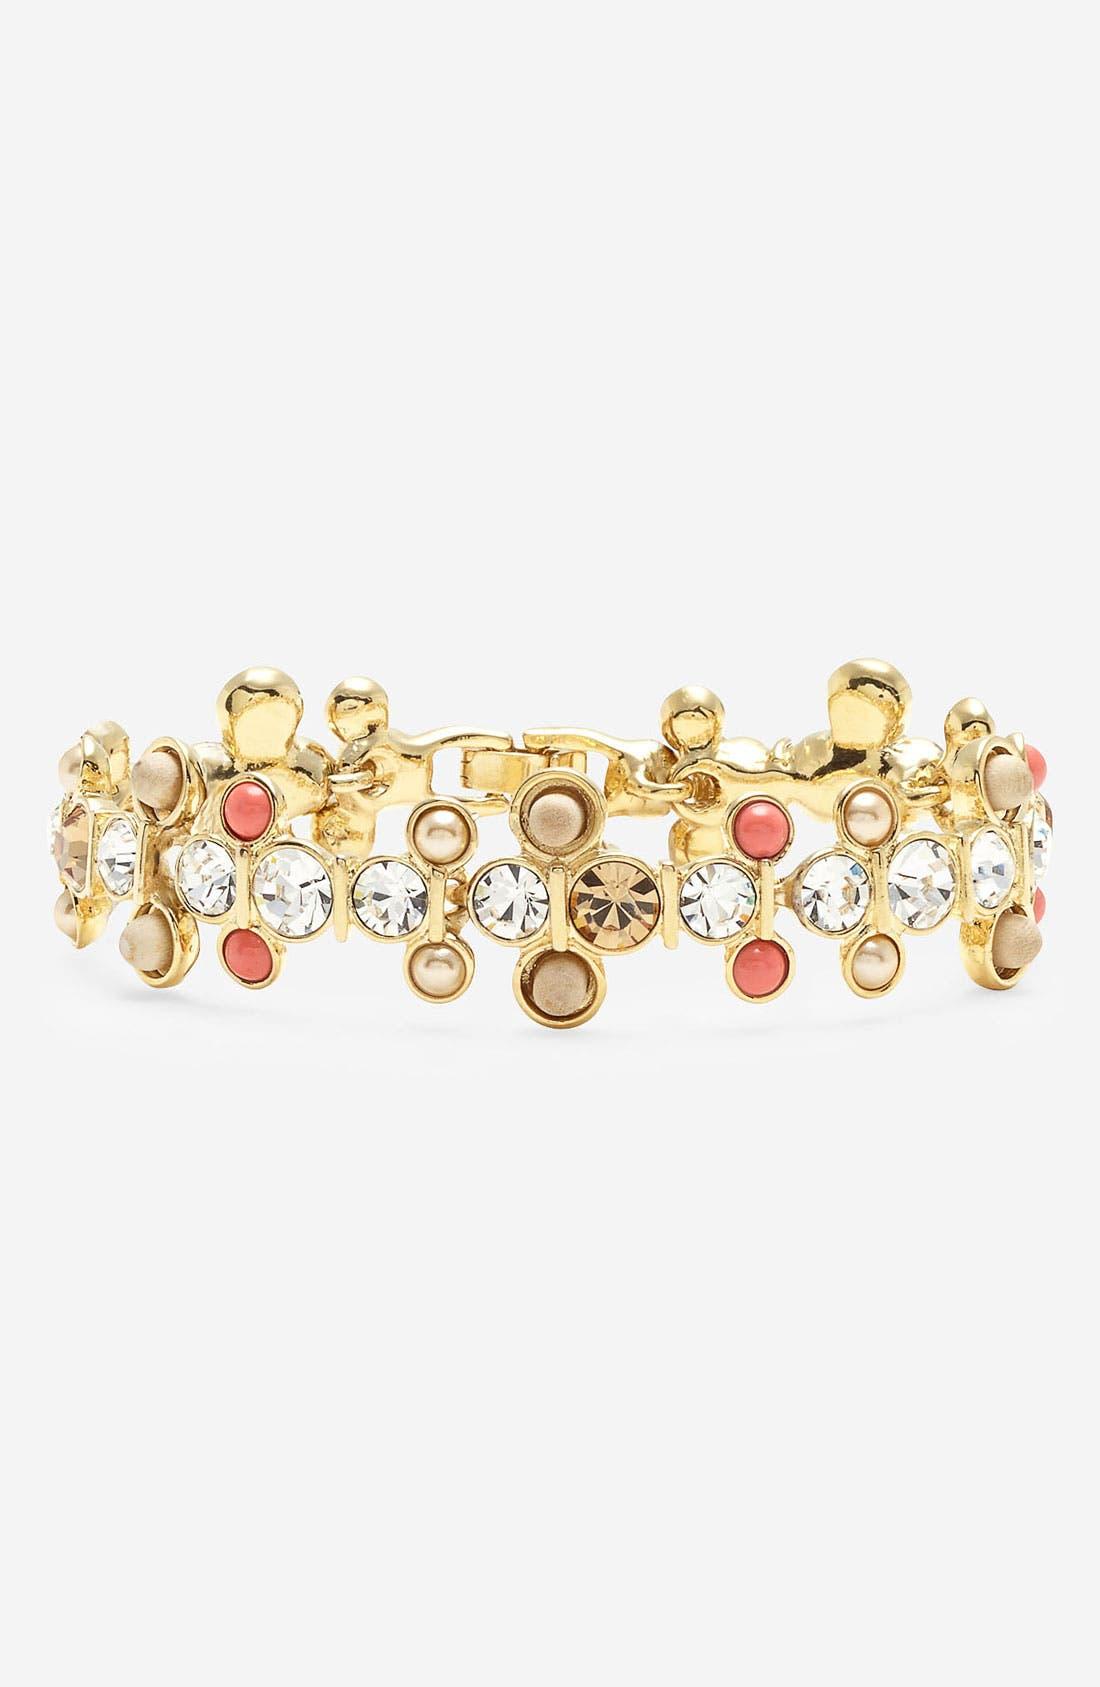 Main Image - Givenchy 'Lark' Crystal & Bead Line Bracelet